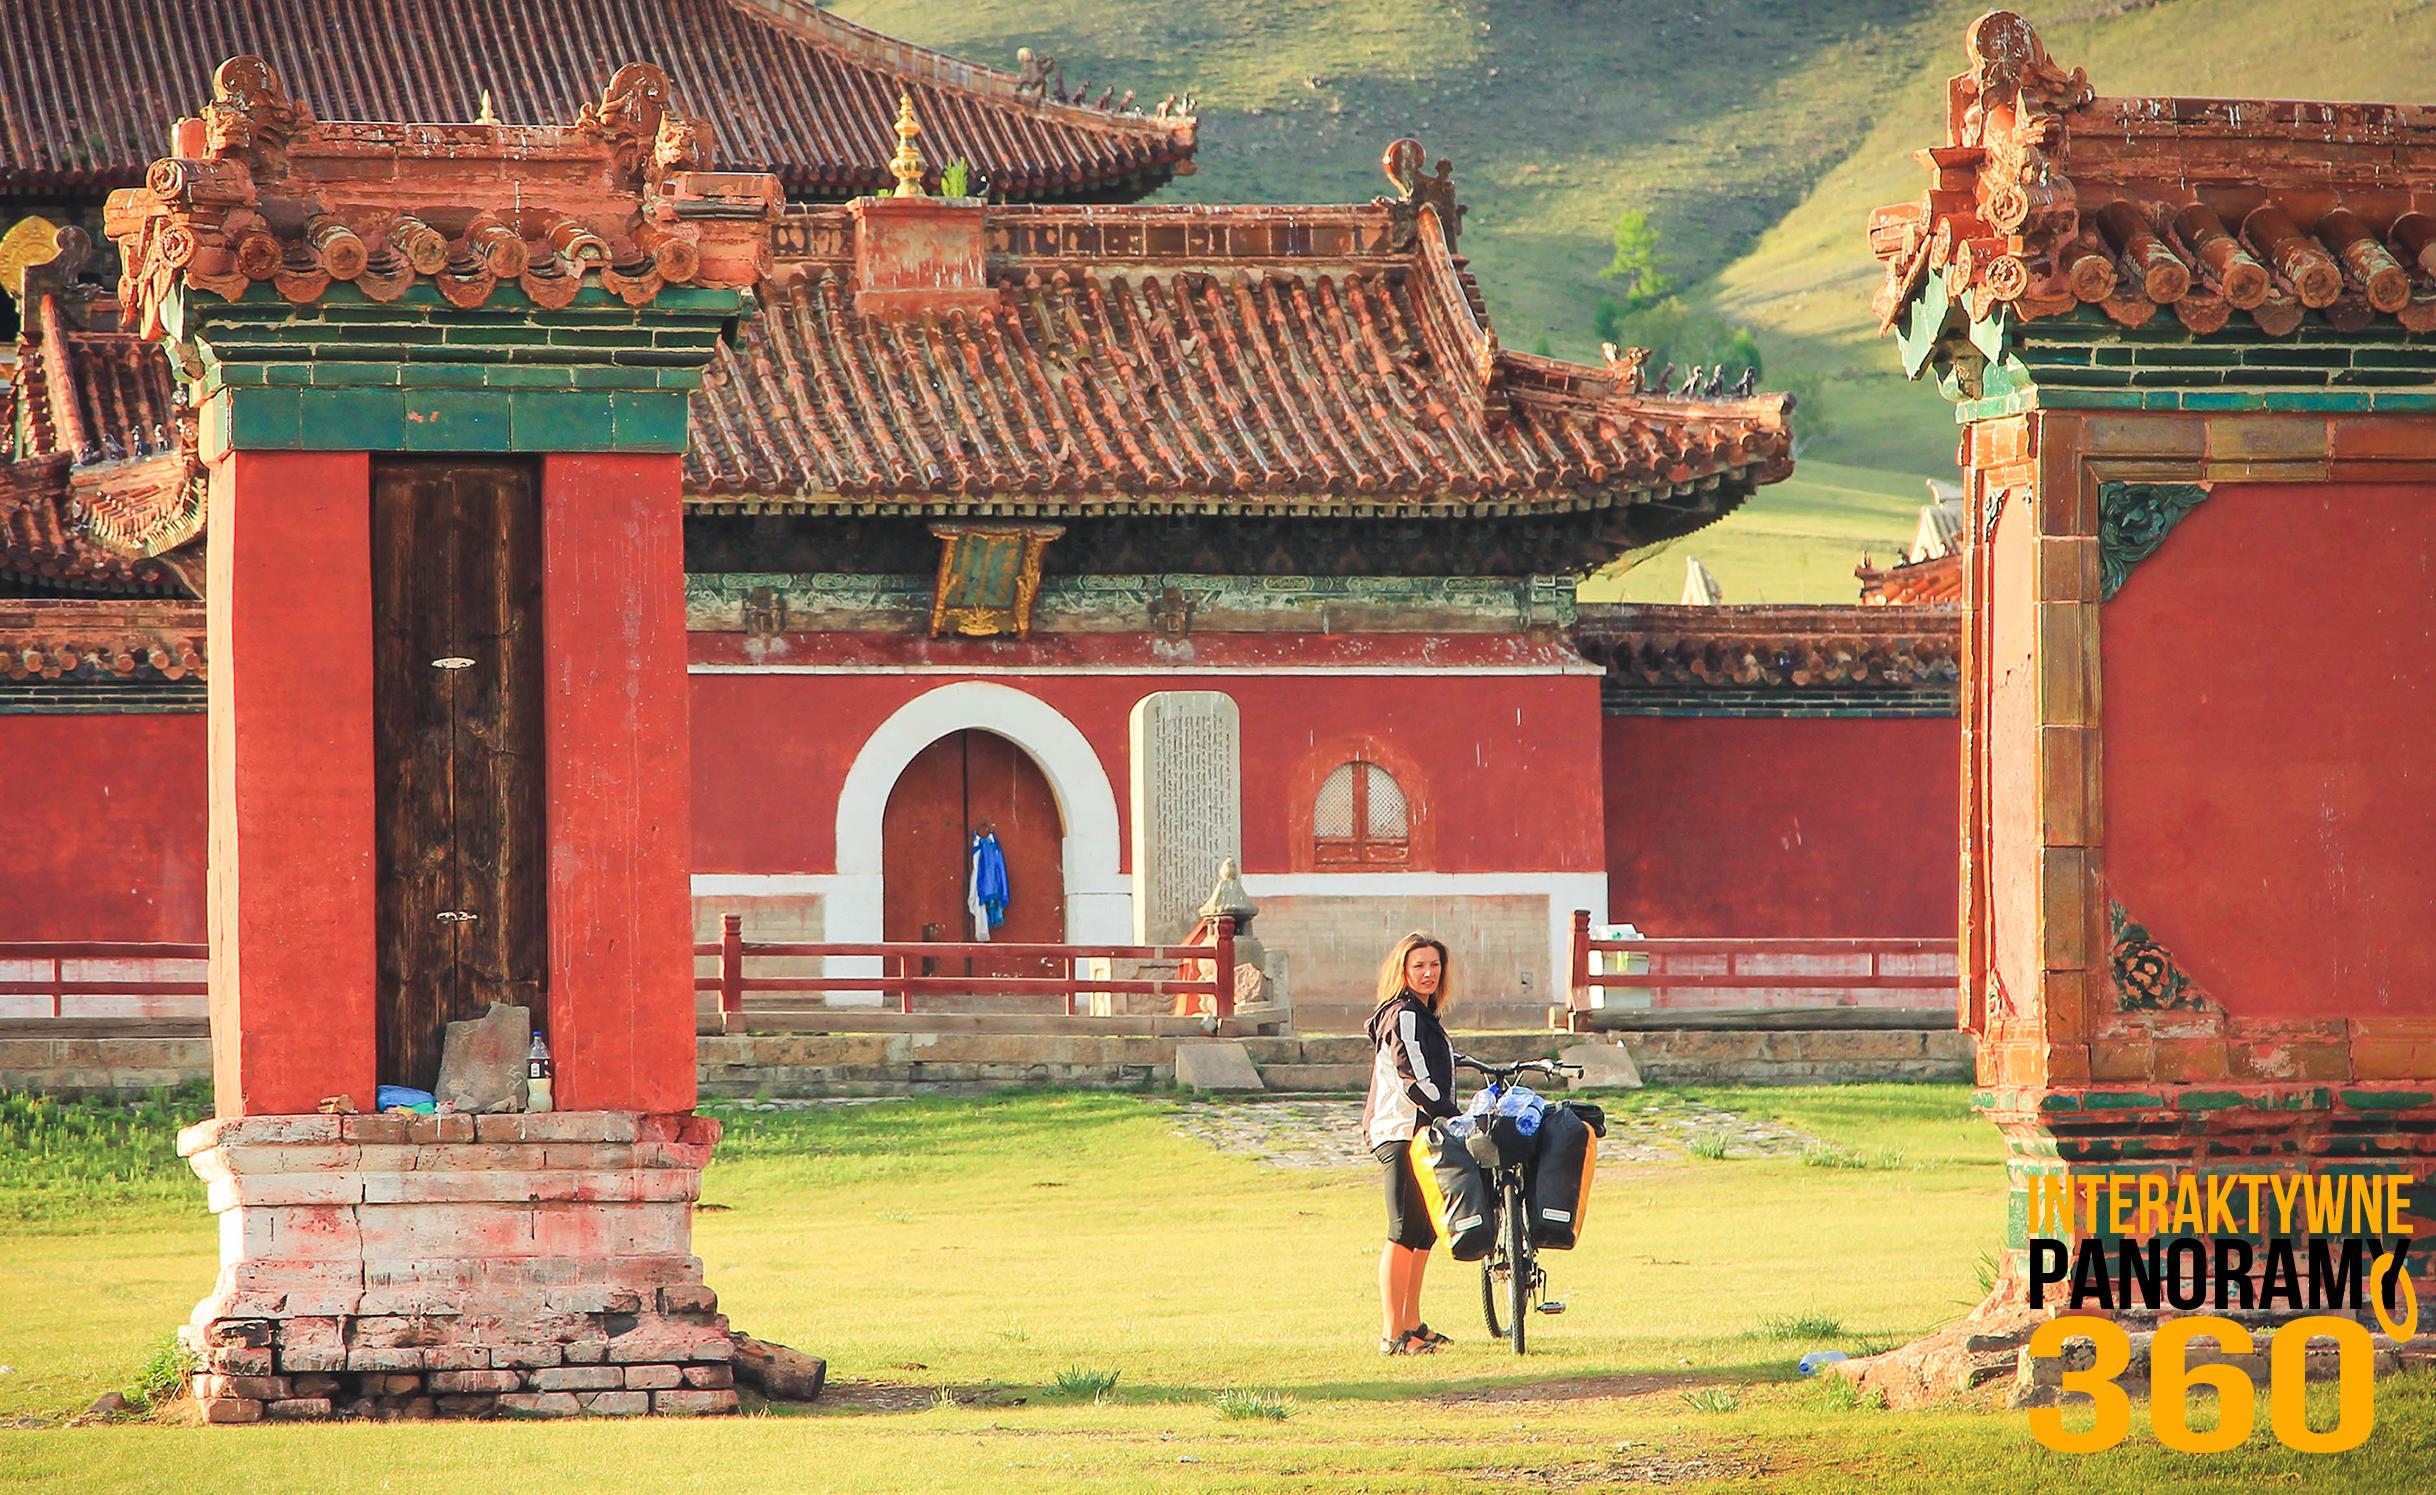 Mongolia monastyr amarbayasgalant buddyjski